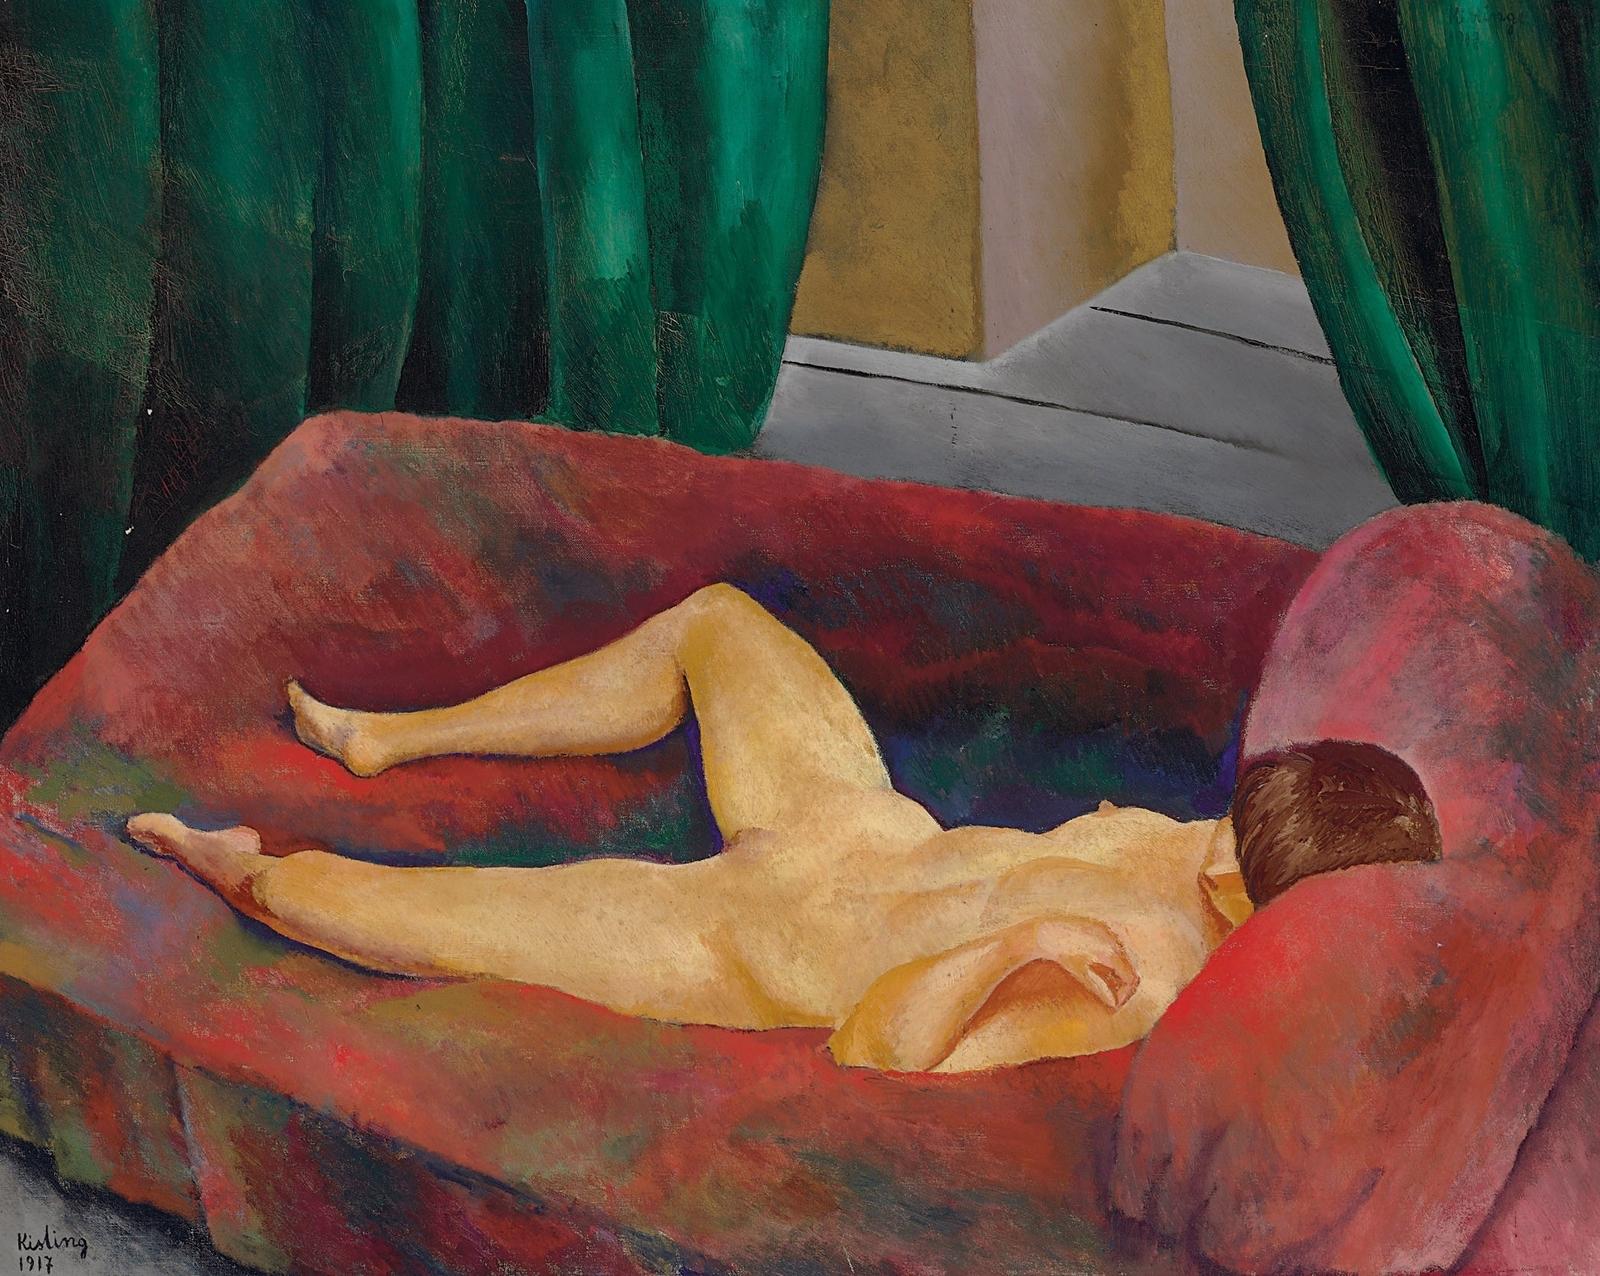 Моисей Кислинг. 1917. Ожидание (The Waiting). 79.7 x 99.. Холст, масло. Частное собрание.